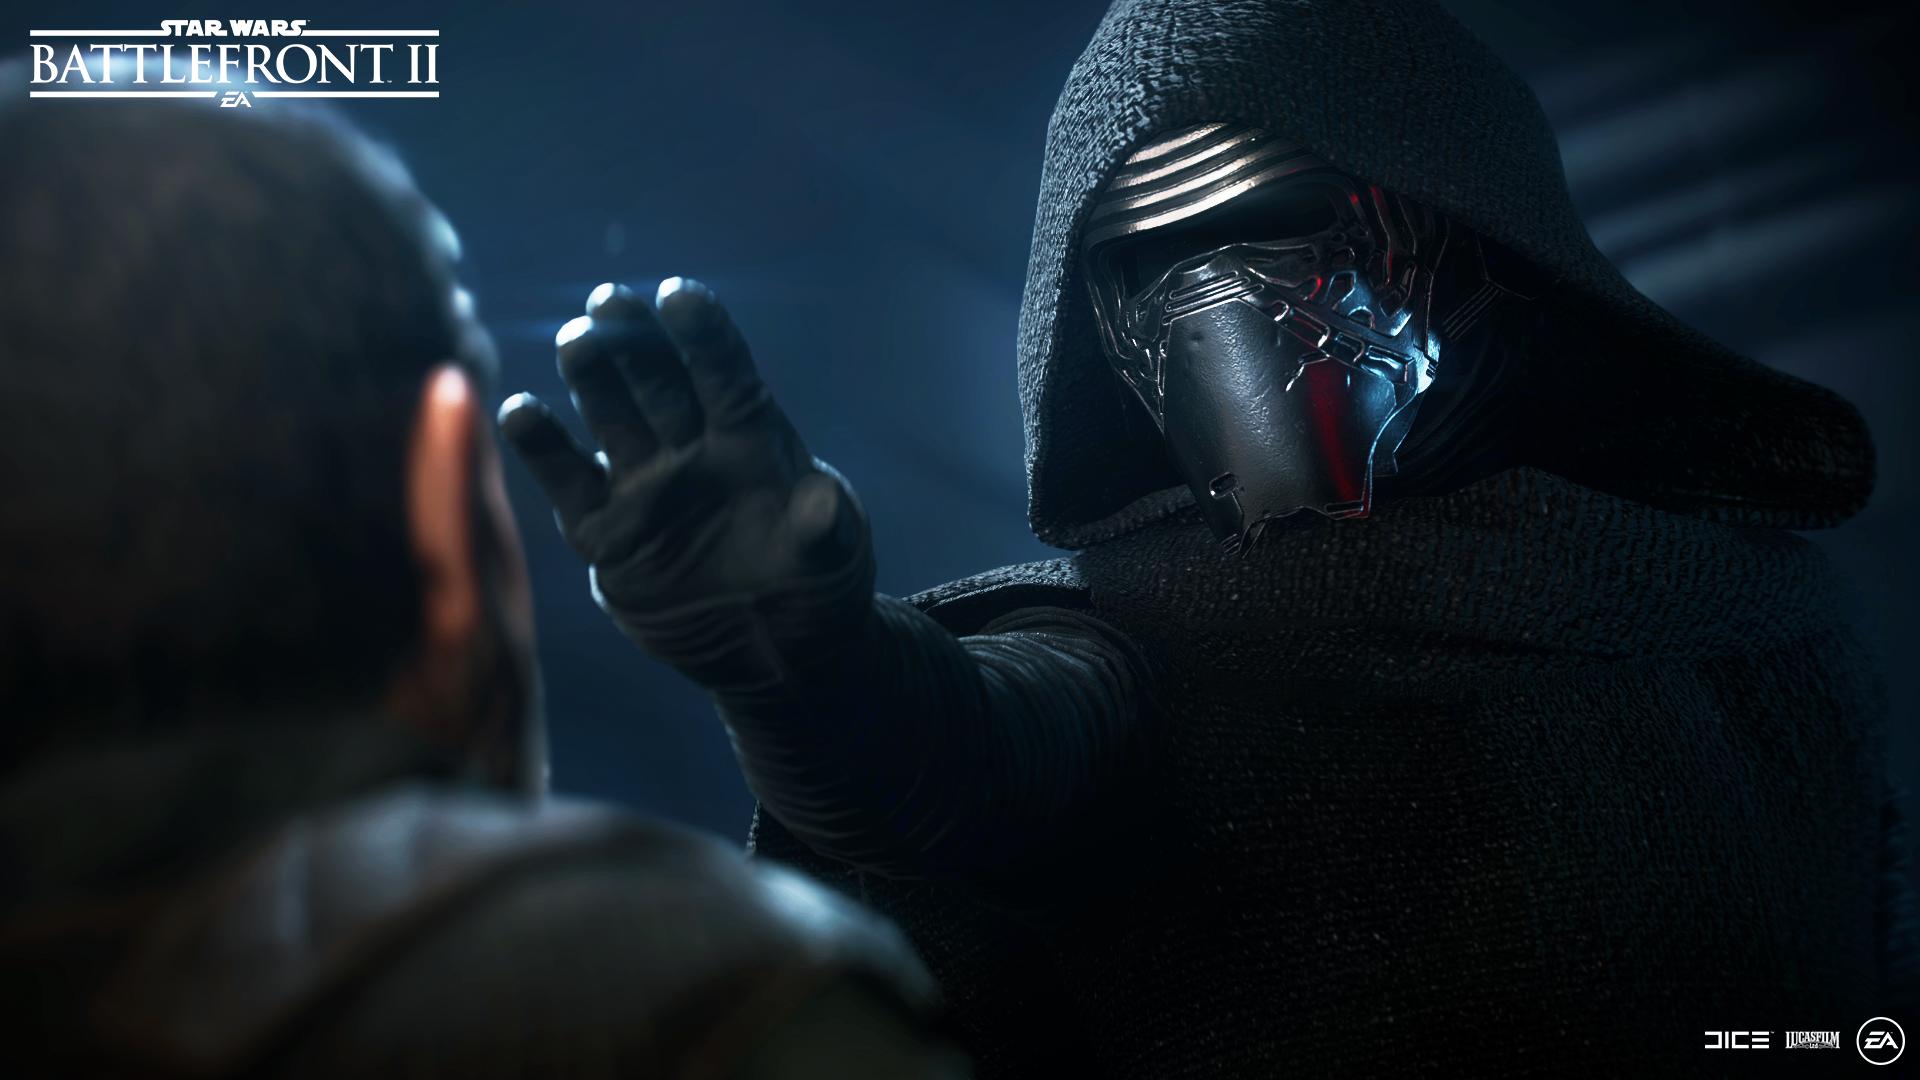 Star Wars Battlefront 2 Petition Demands Paid Dlc But Dice Says No